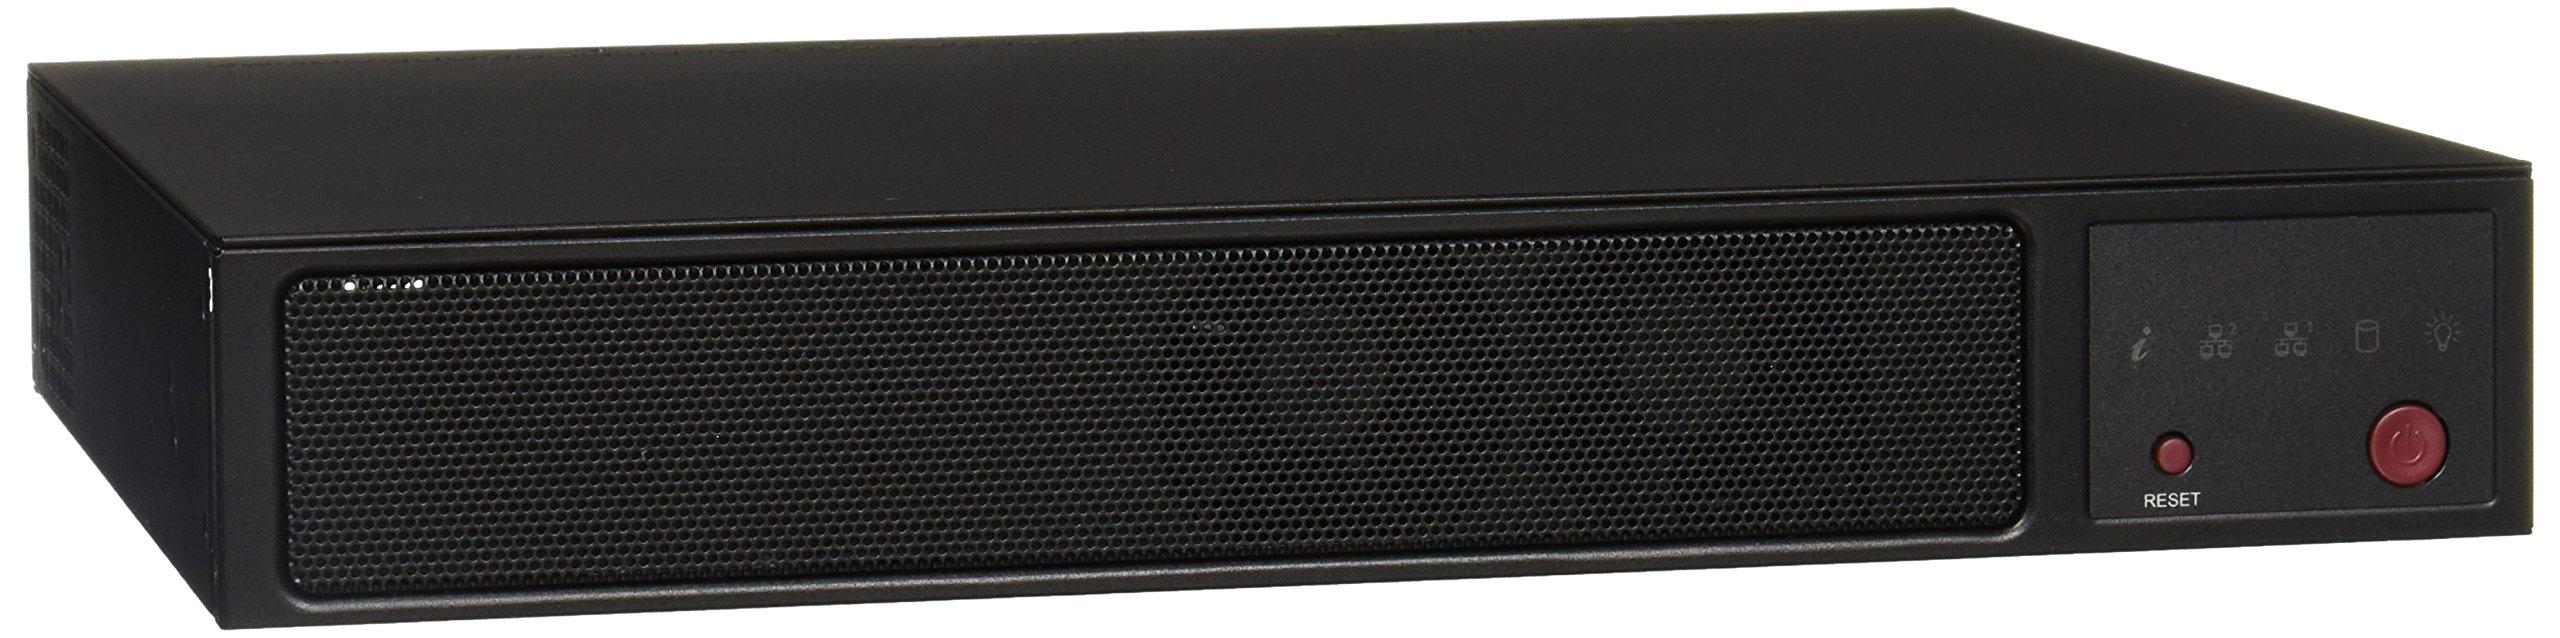 Supermicro SuperServer E300-8D - Mini-1U - Xeon D-1518 2.GHz - 0 MB - 0 G